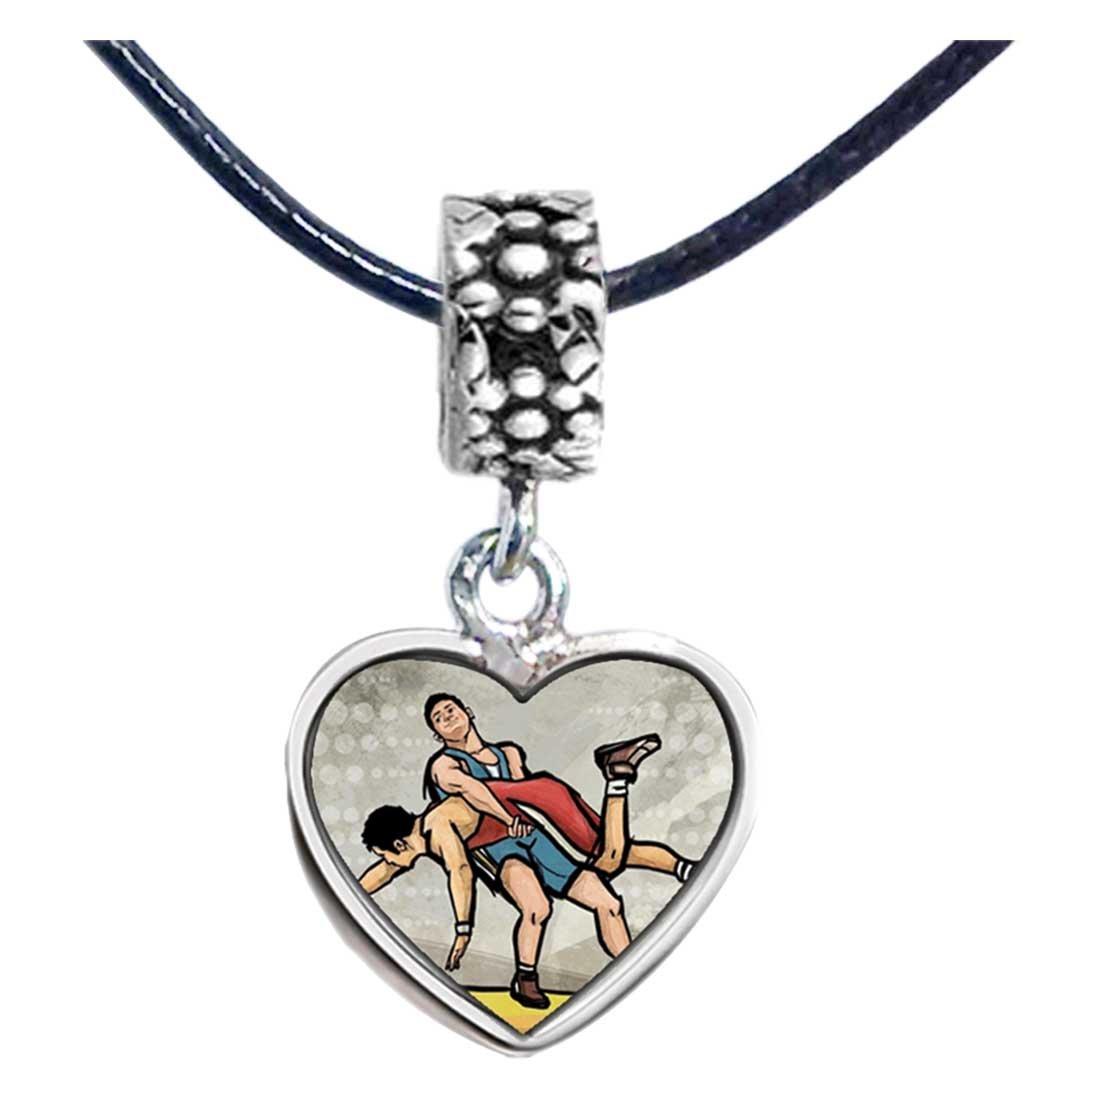 GiftJewelryShop Silver Plated Olympics Wrestling Photo Flower Head Dangle Heart Bead Charm Bracelets